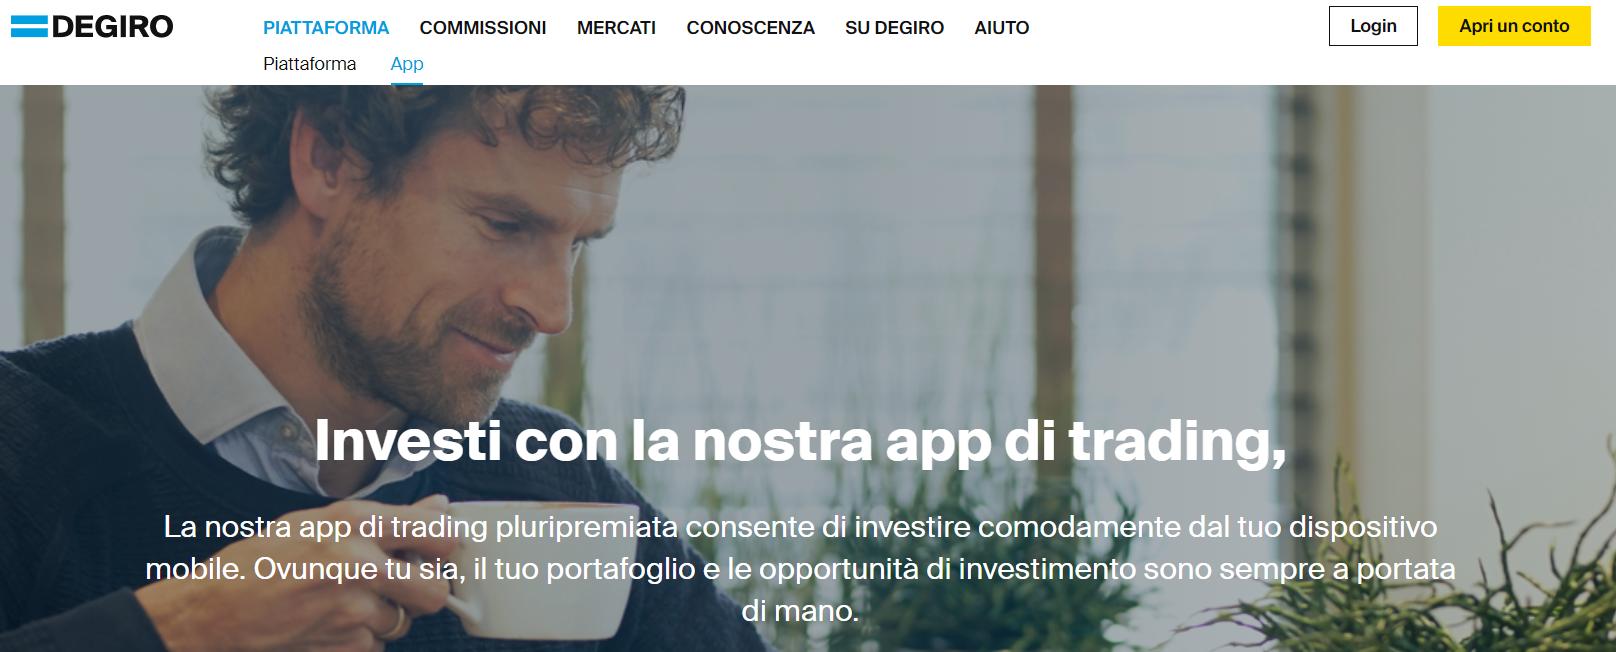 app trading online principianti